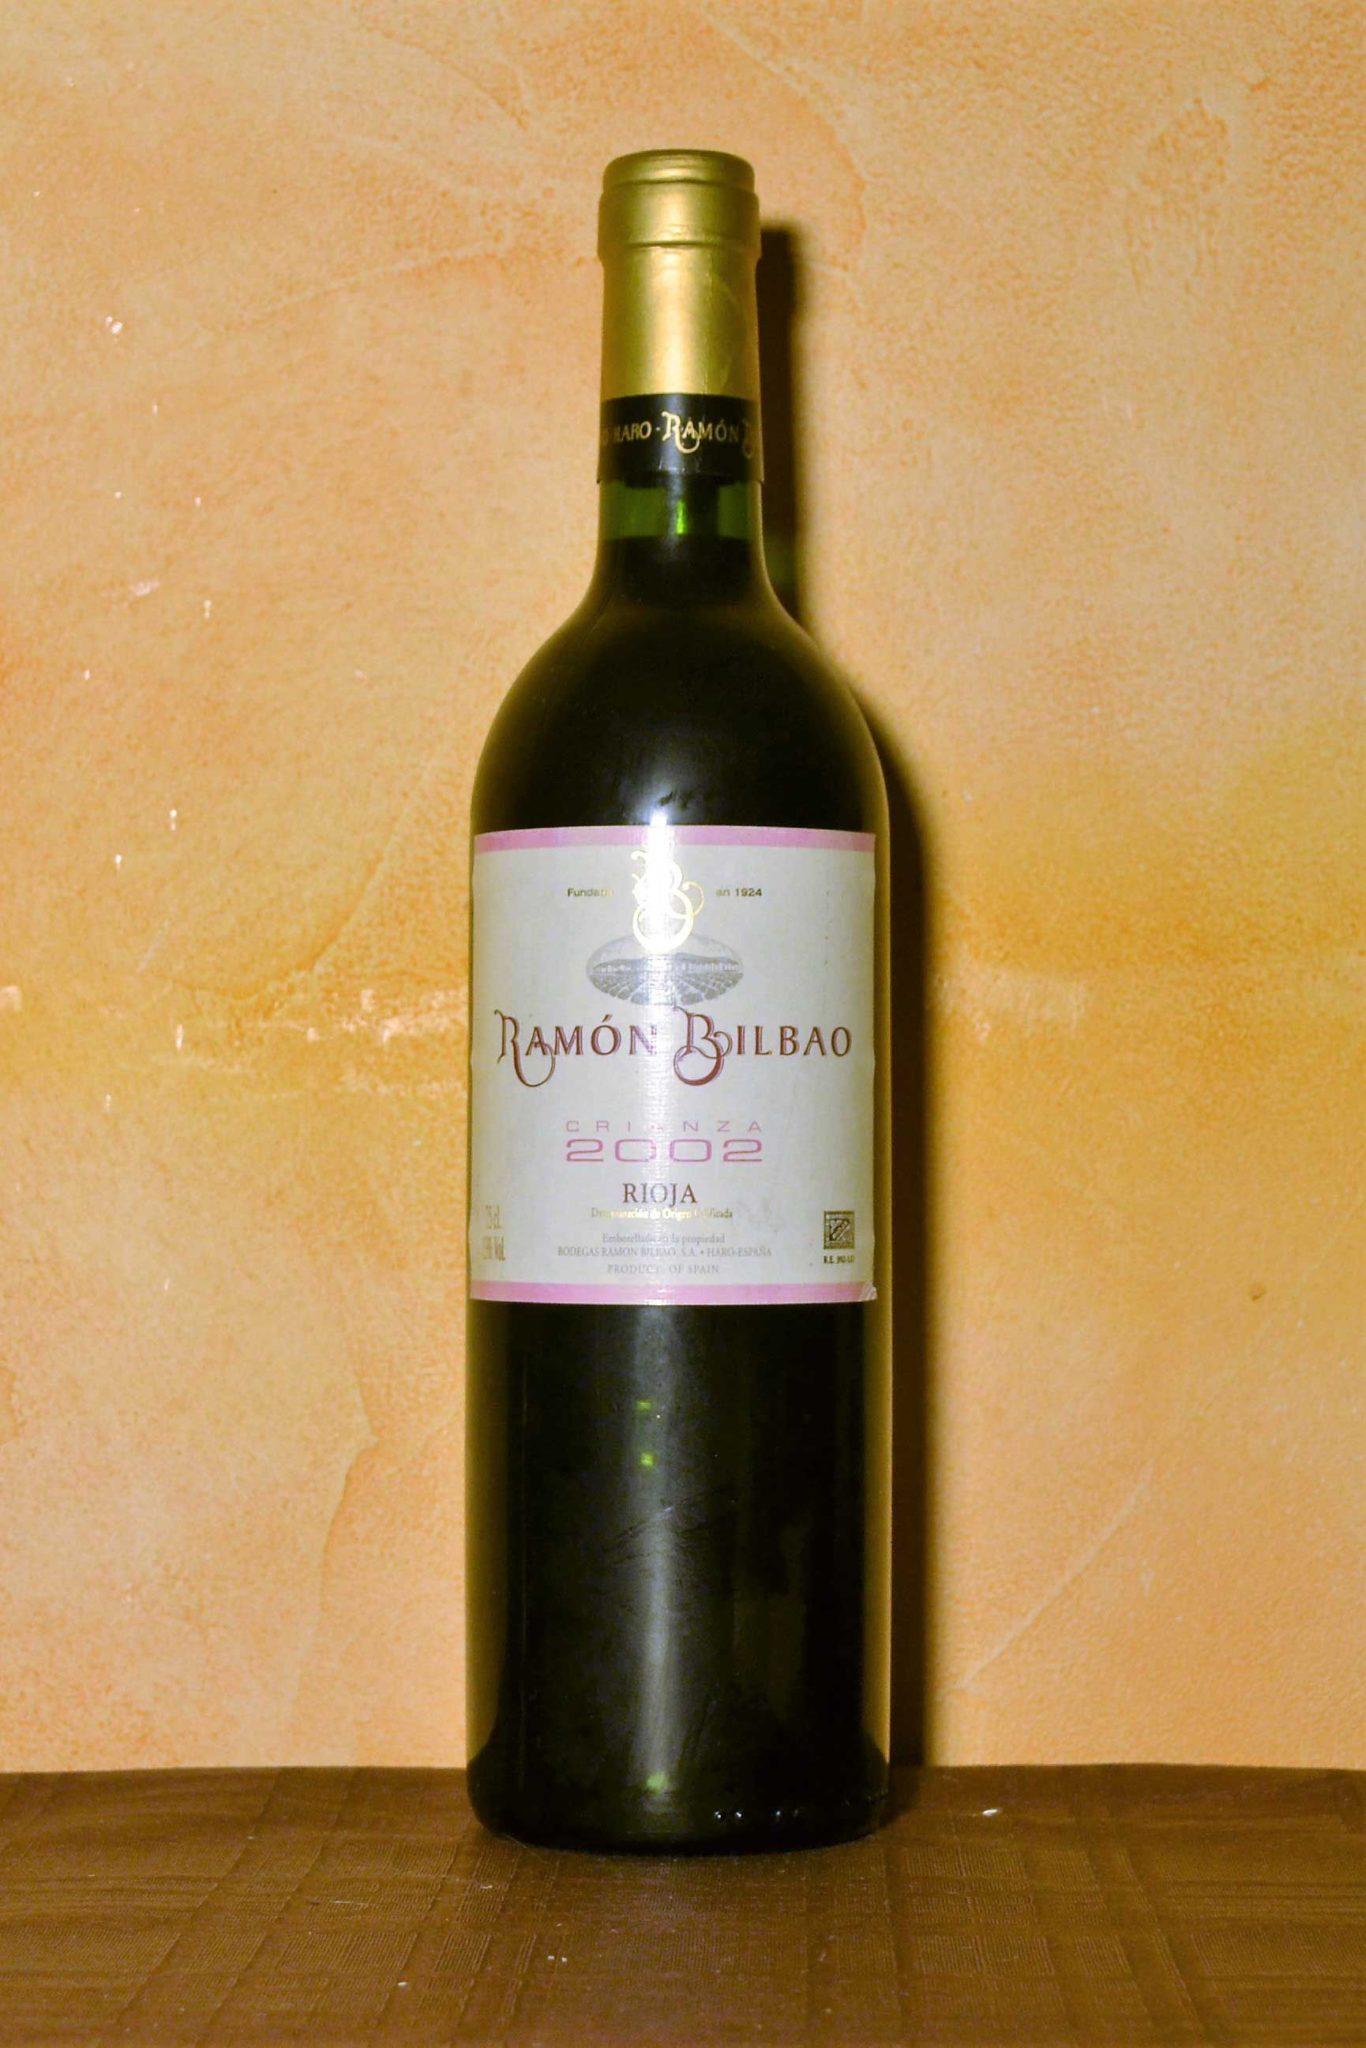 Ramon Bilbao Crianza 2002